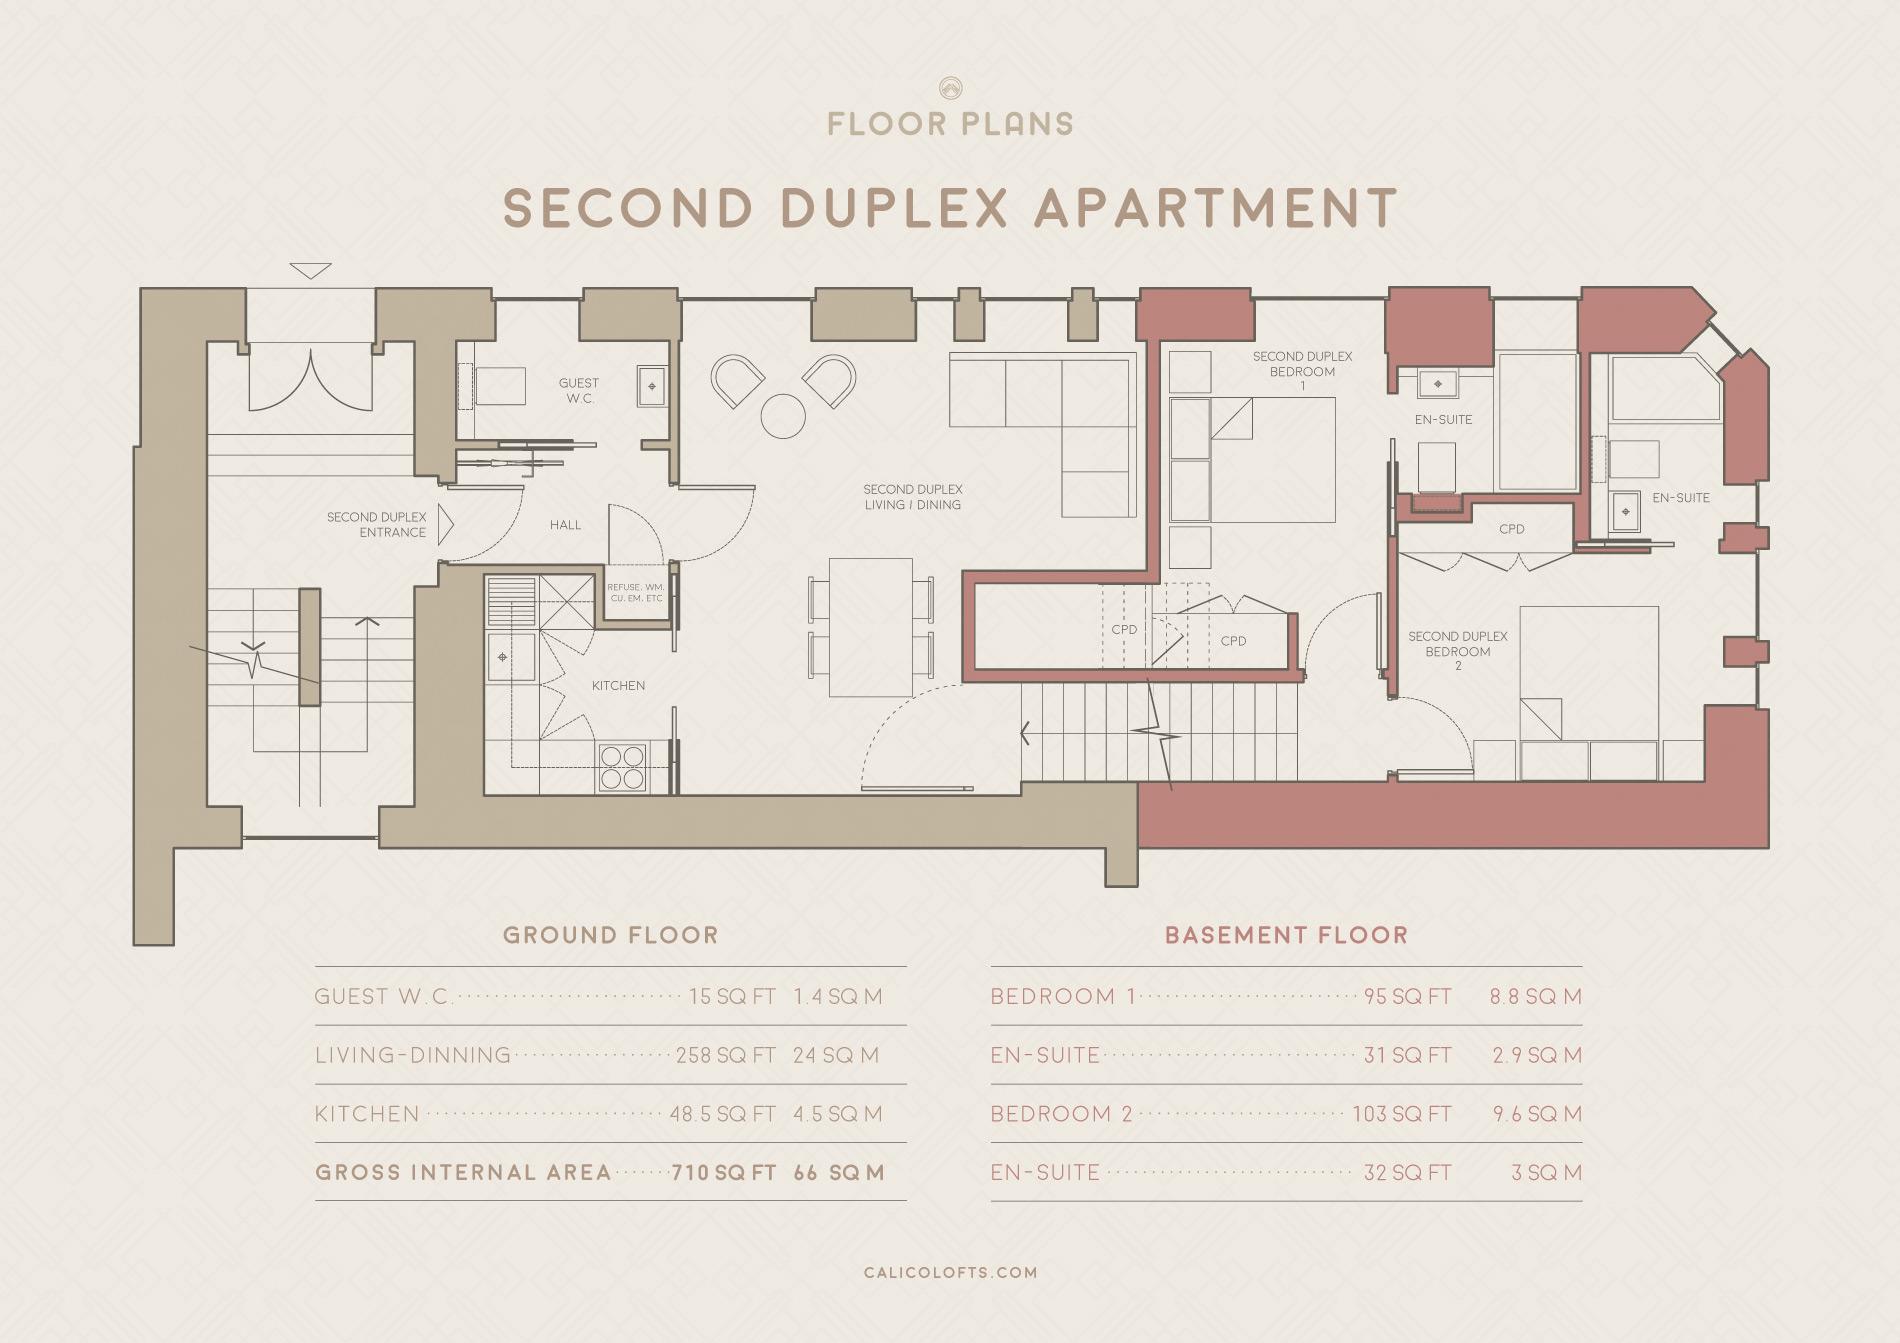 calico-floorplan-second-duplex